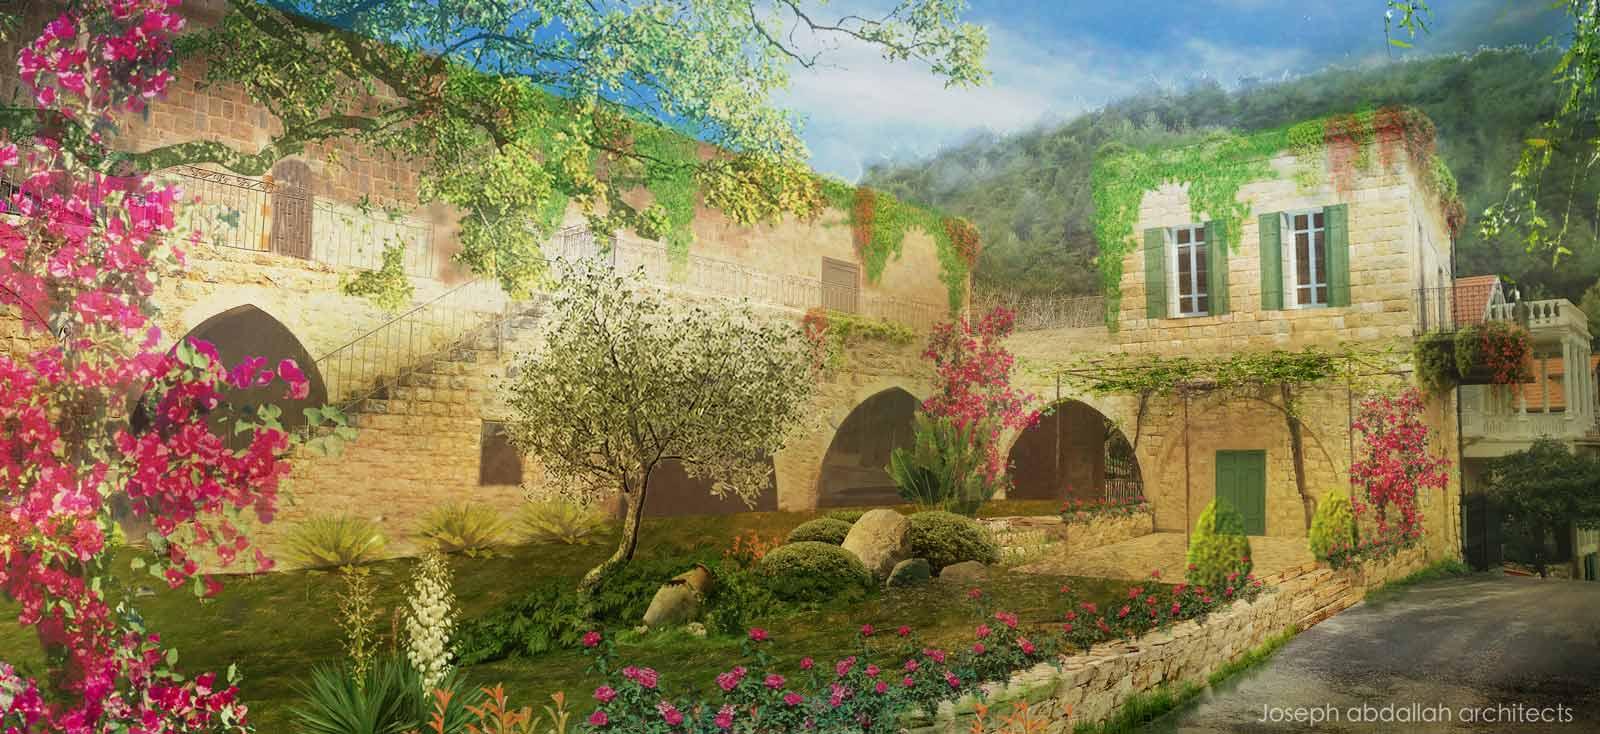 azoury-mounment-old-architecture-restoration-lebanon-joseph-abdallah-architects-3